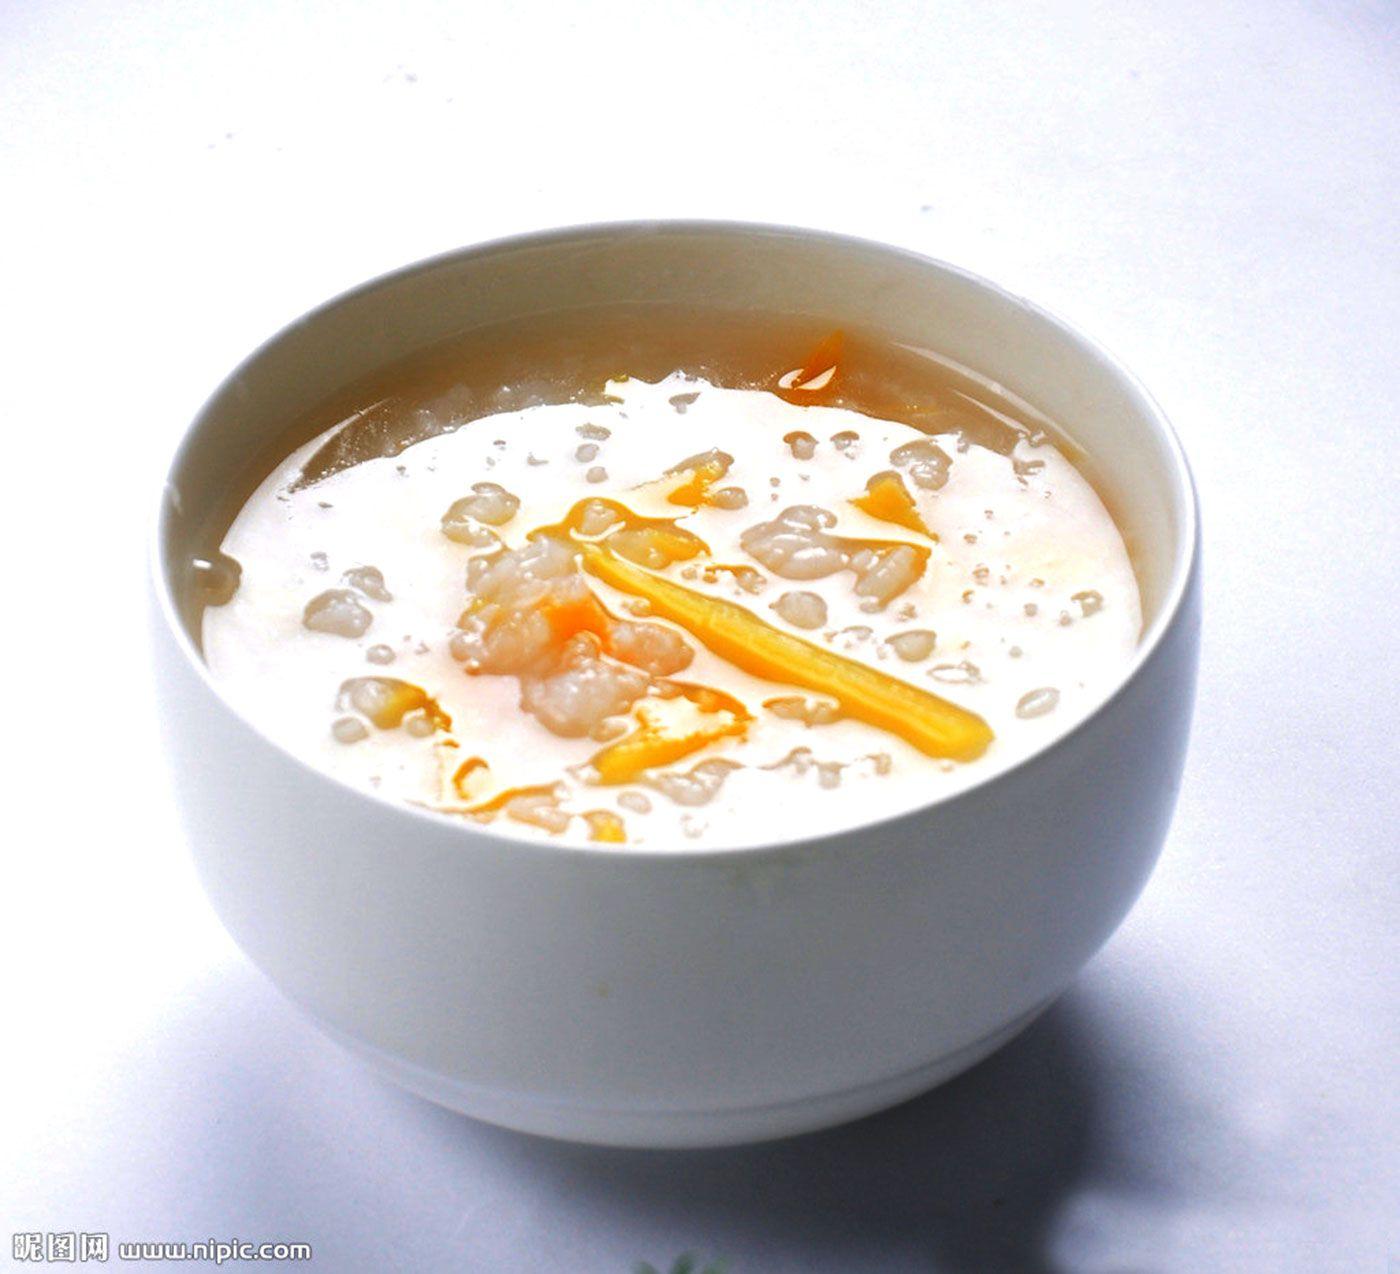 Sweet Potato Porridge  https://beijingtoday.com.cn/2015/11/learn-to-make-sweet-potato-porridge/